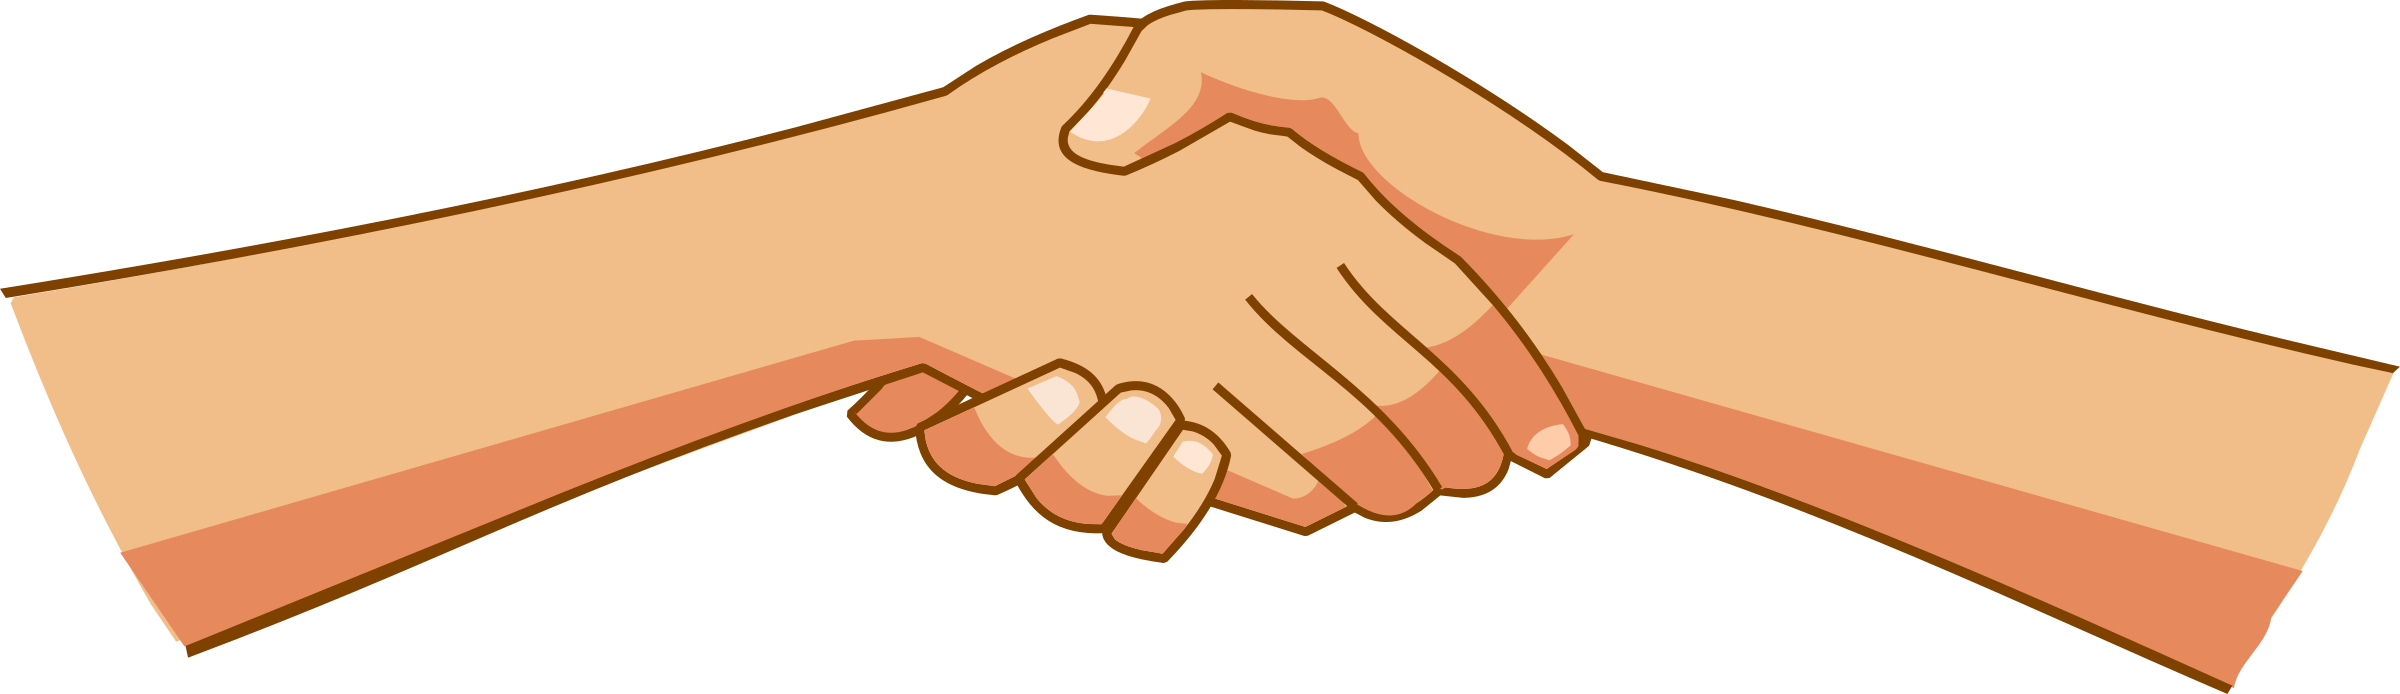 picture black and white stock Handshake clipart shake hand. Shaking hands big image